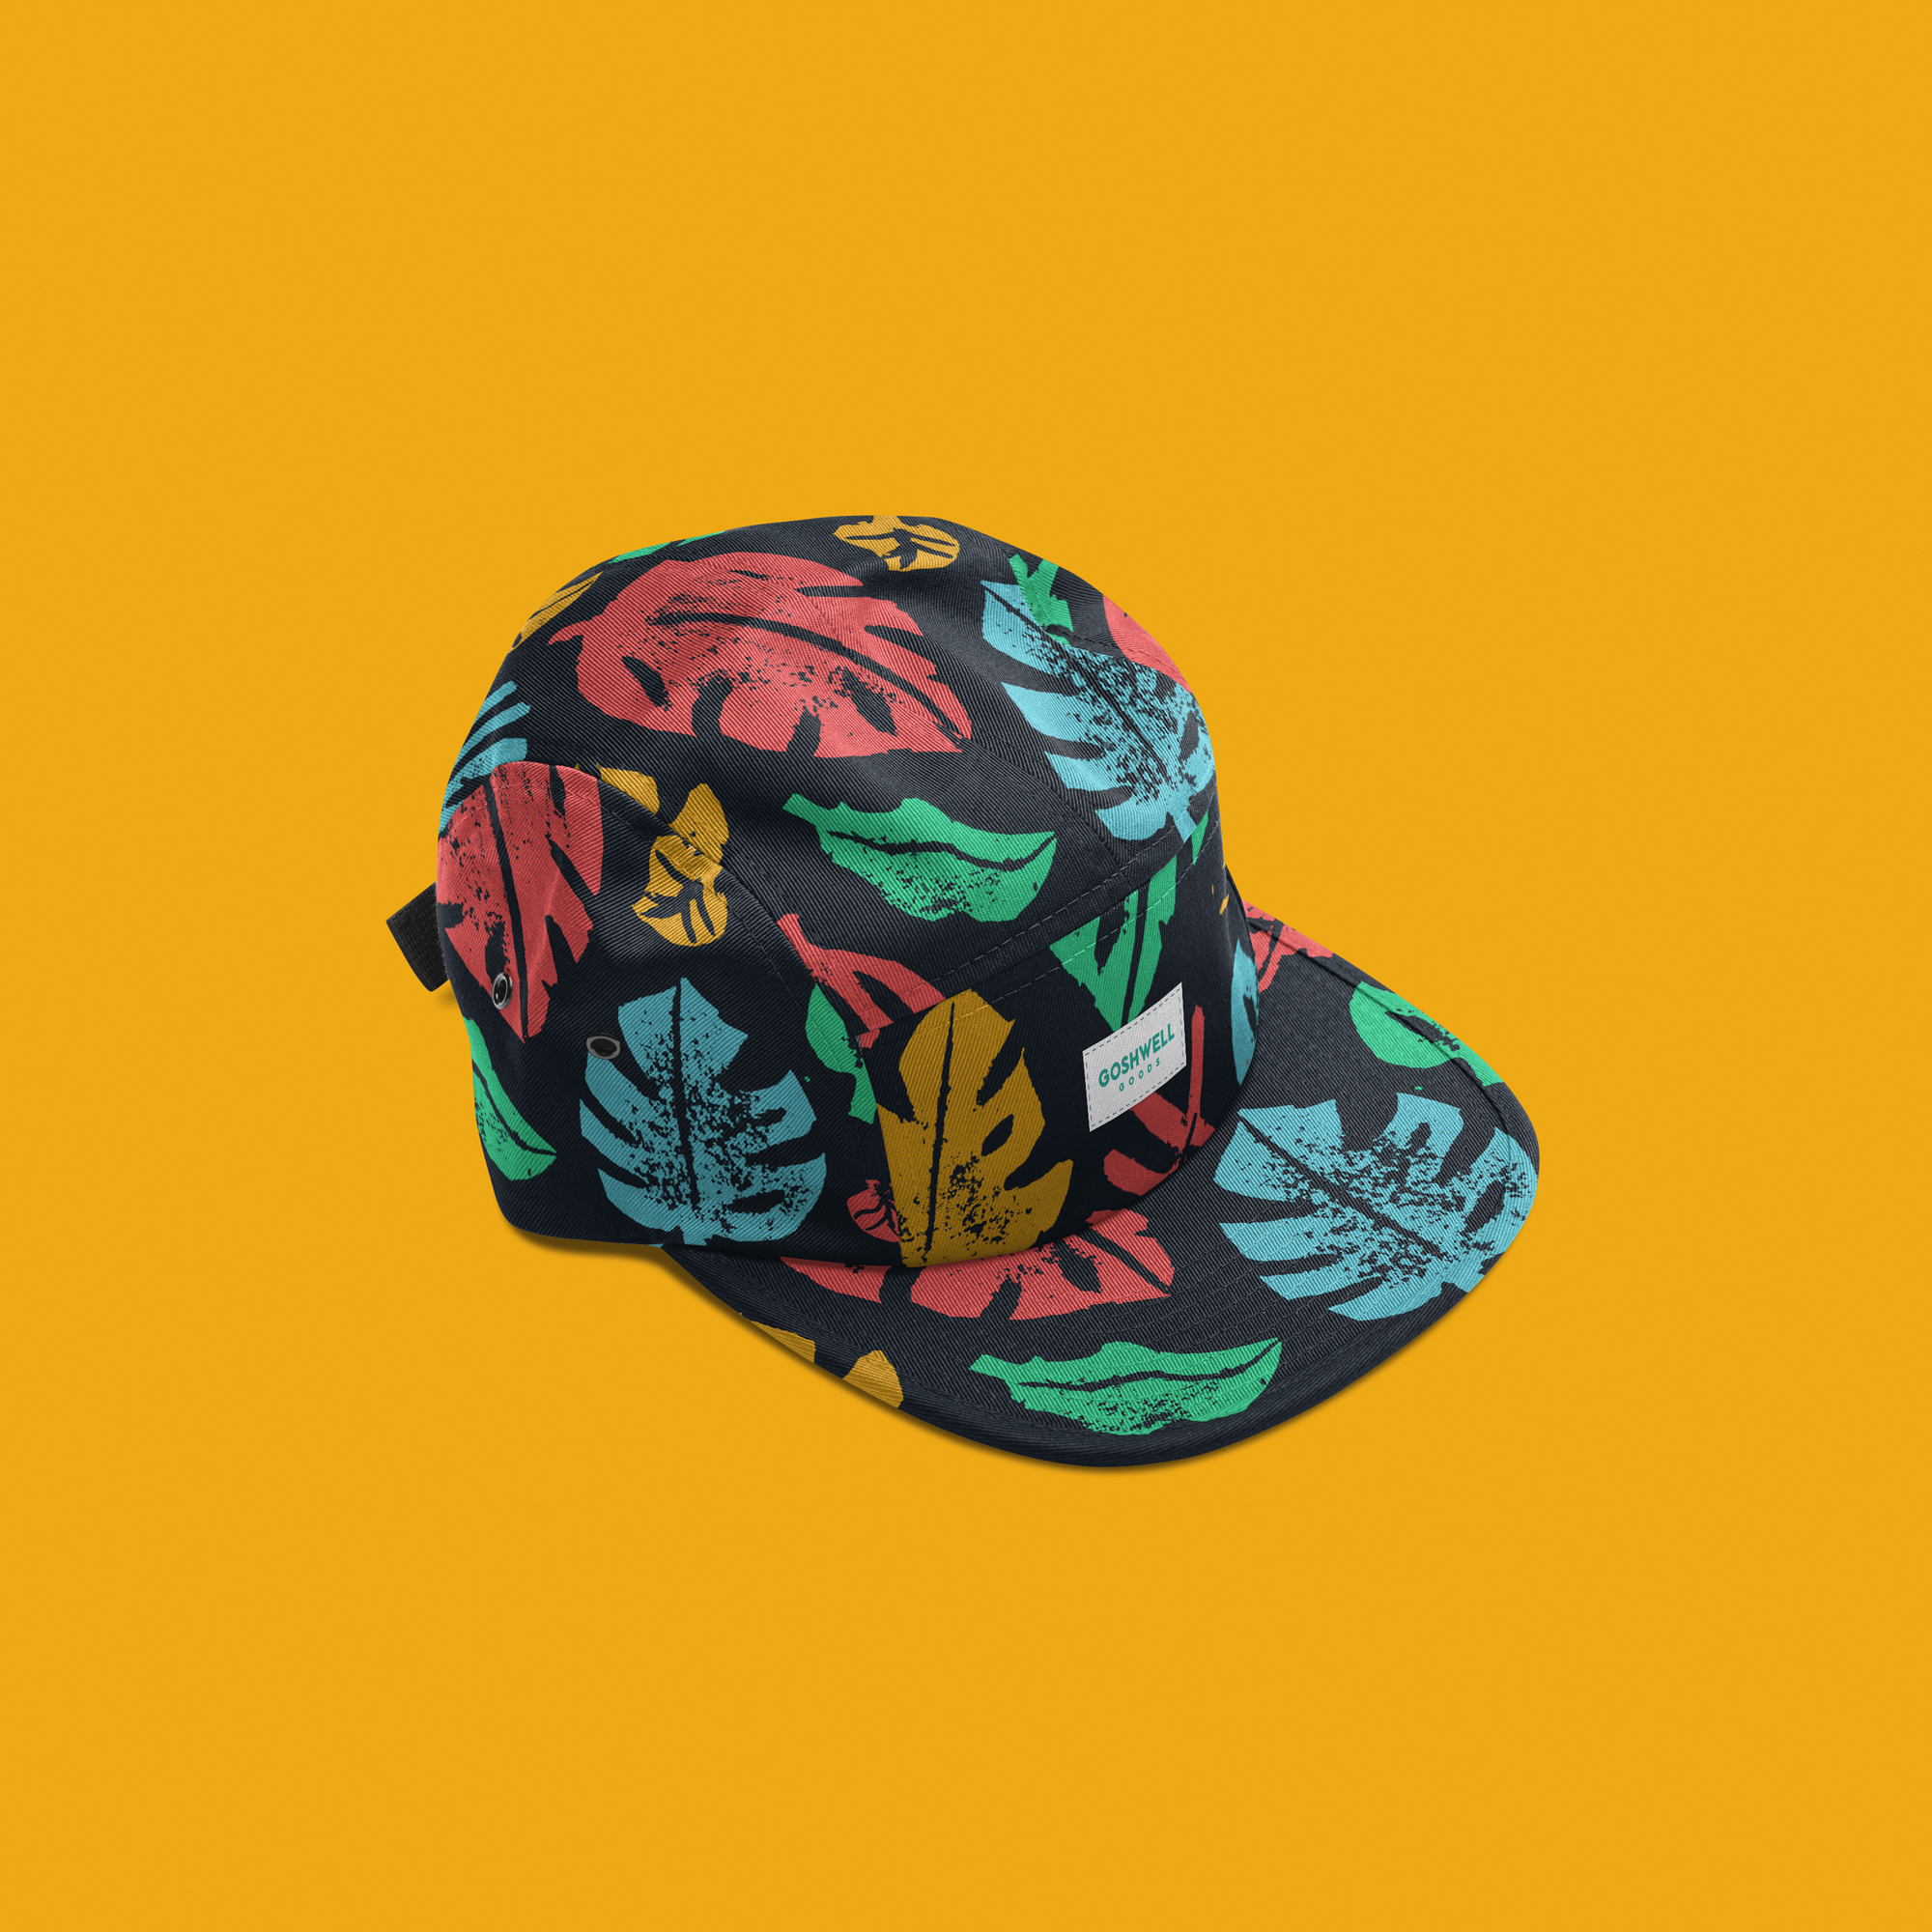 Hat-2-a.jpg